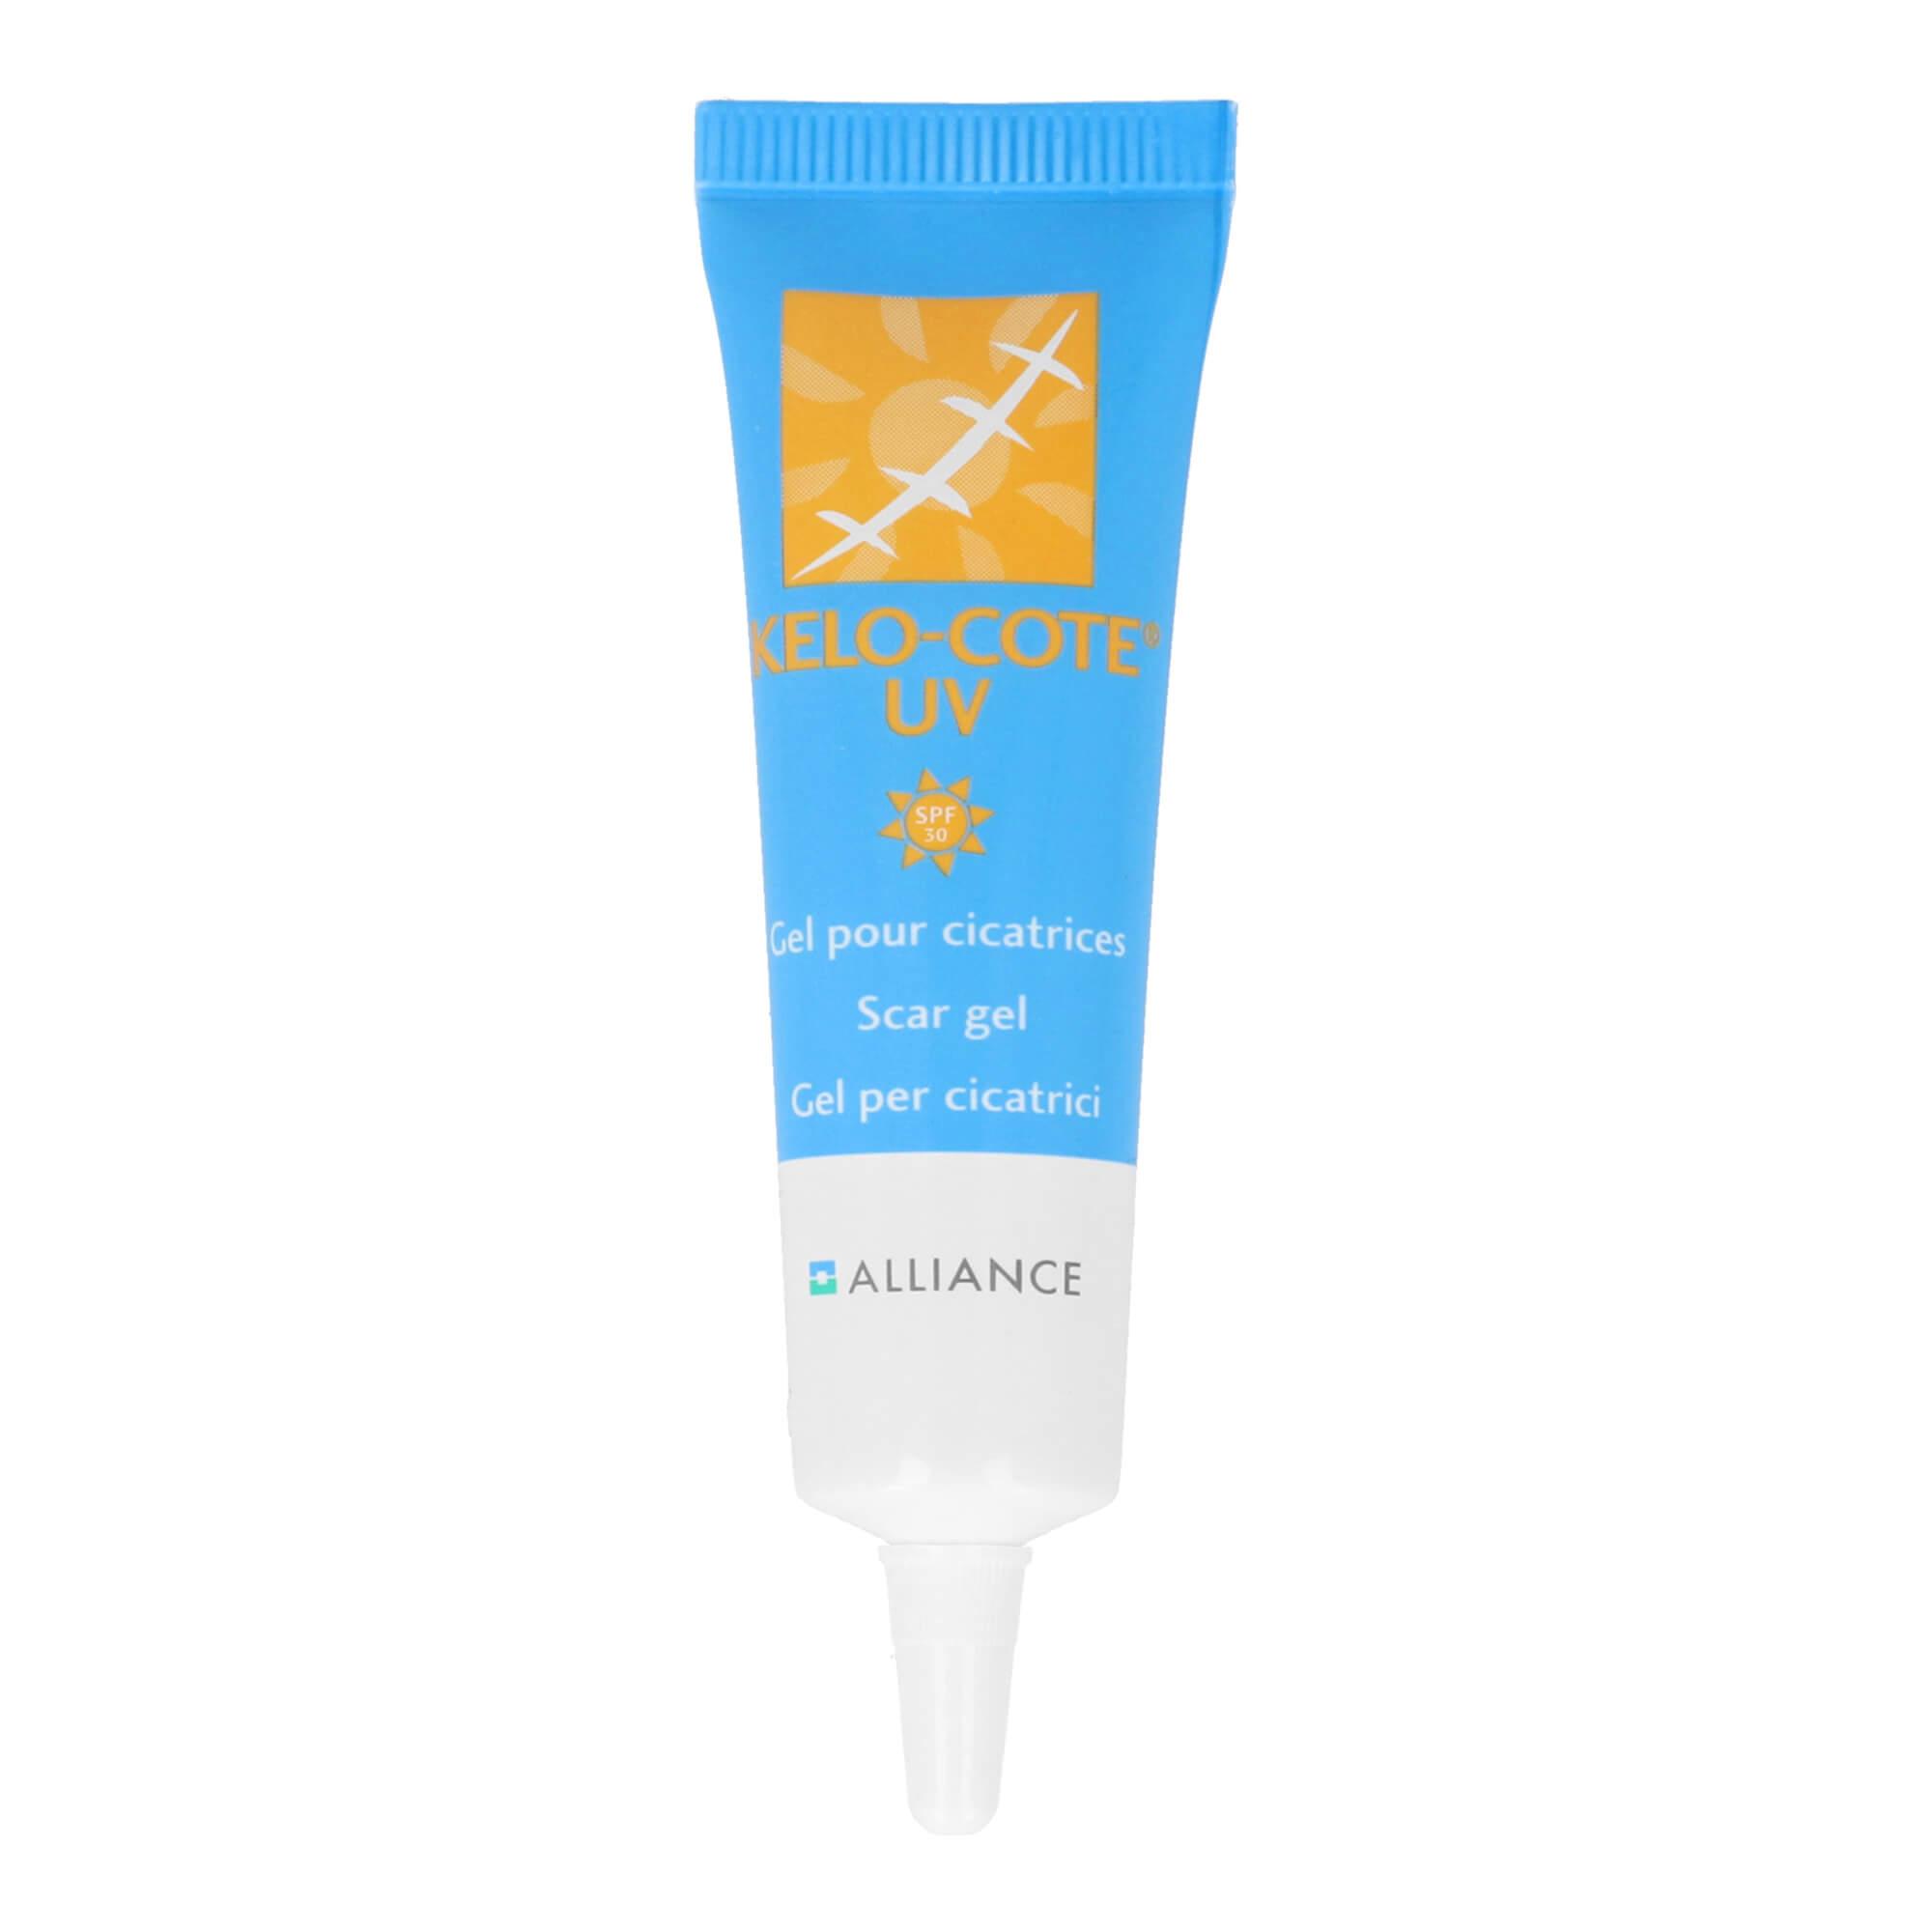 Kelo-Cote UV Silikon-Narbengel LSF 30